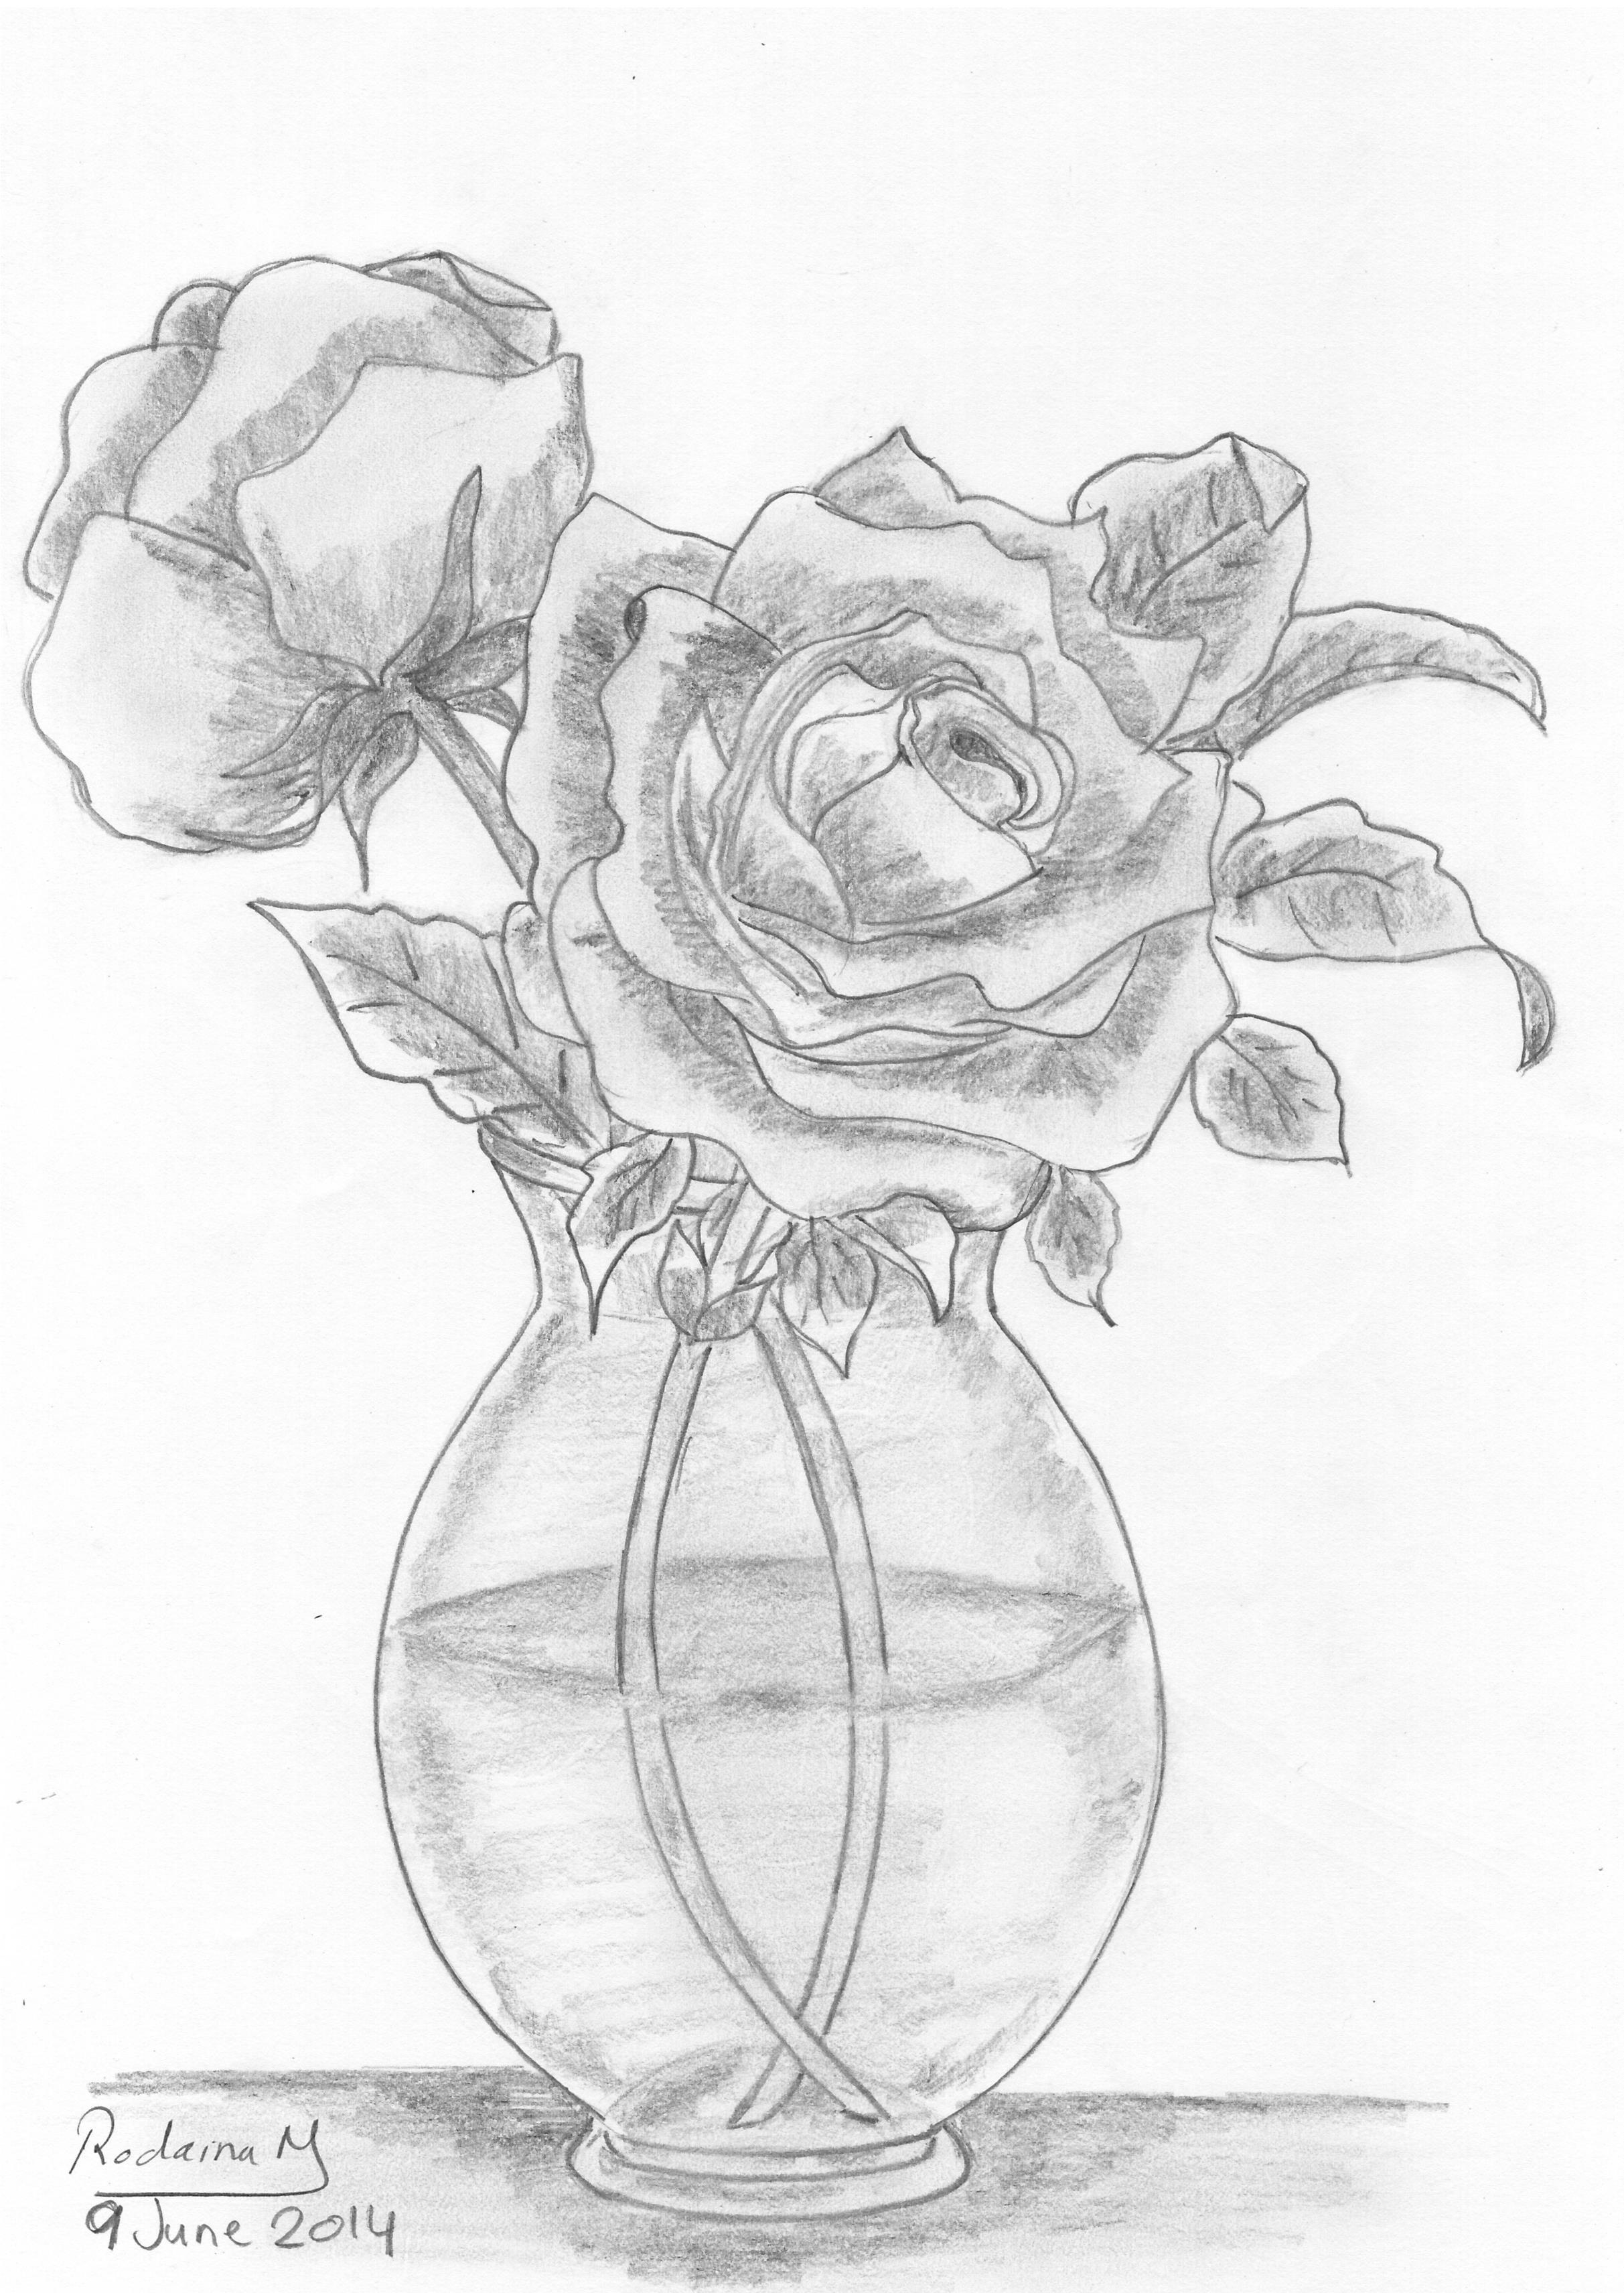 Vase Of Roses Drawn In 2014 Pencil Sketch Roses Flowers Vase Flower Vase Drawing Flower Drawing Roses Drawing